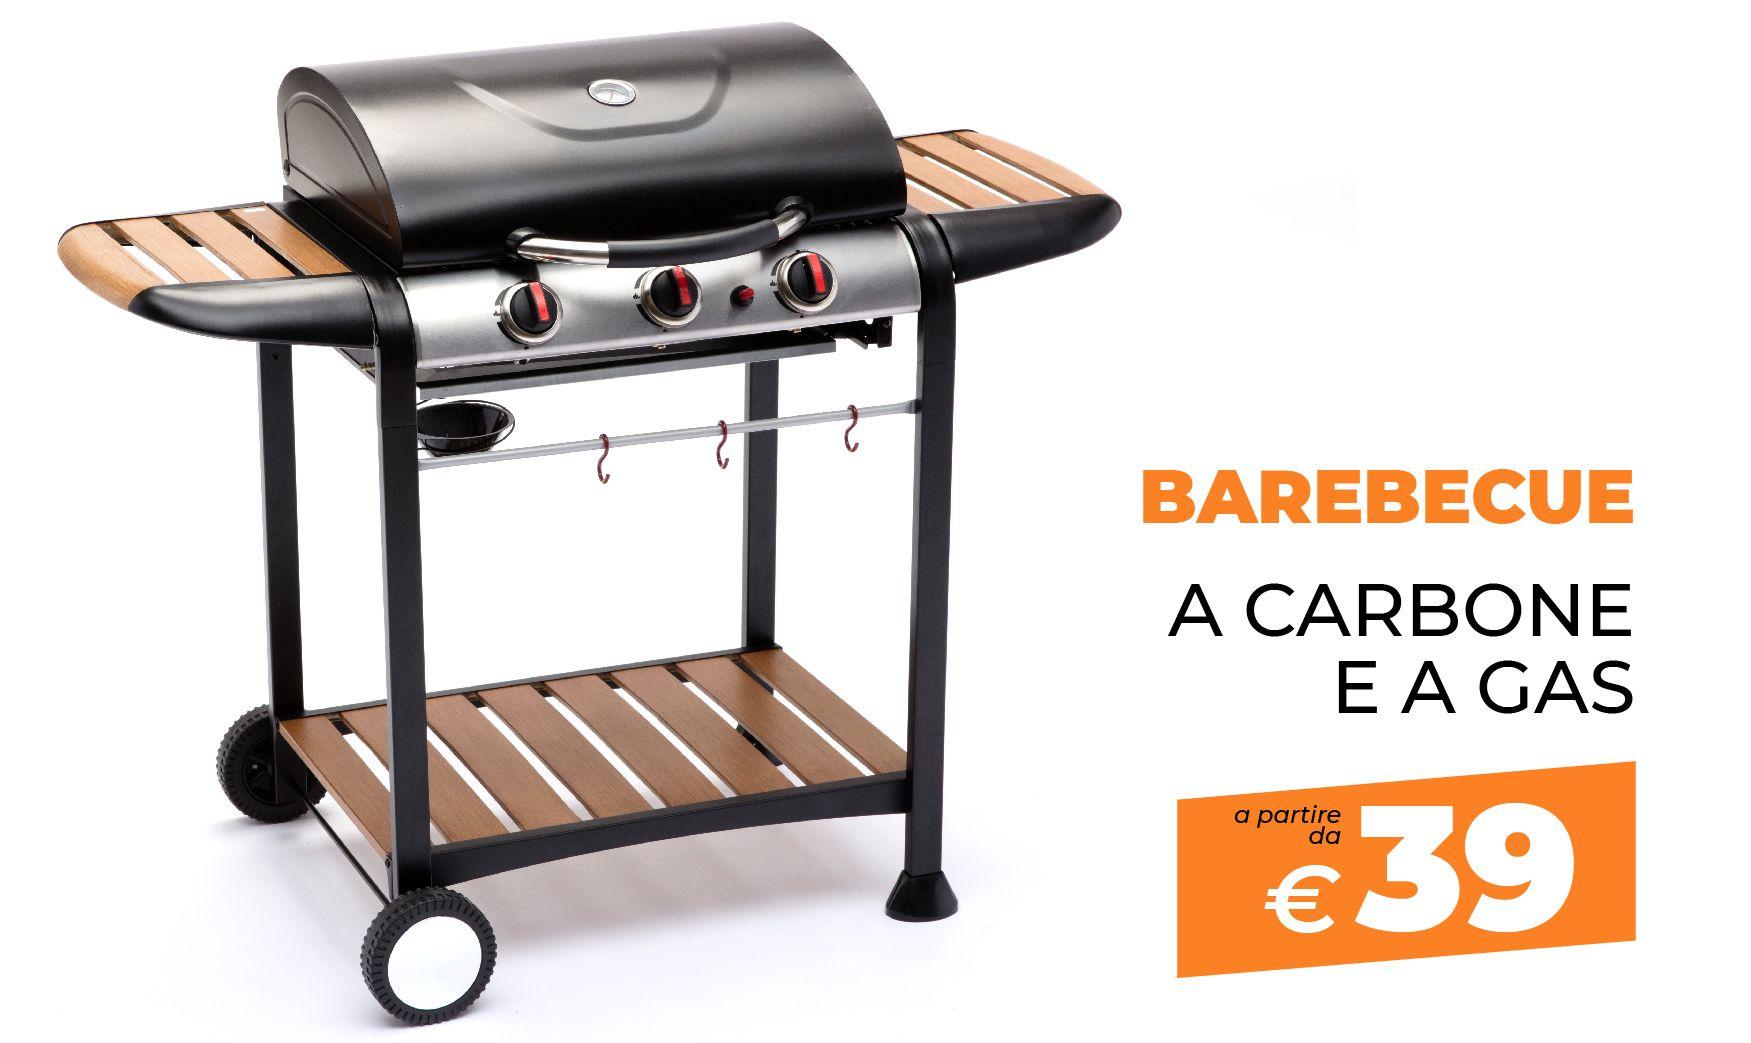 barbecue a gas e a carbone